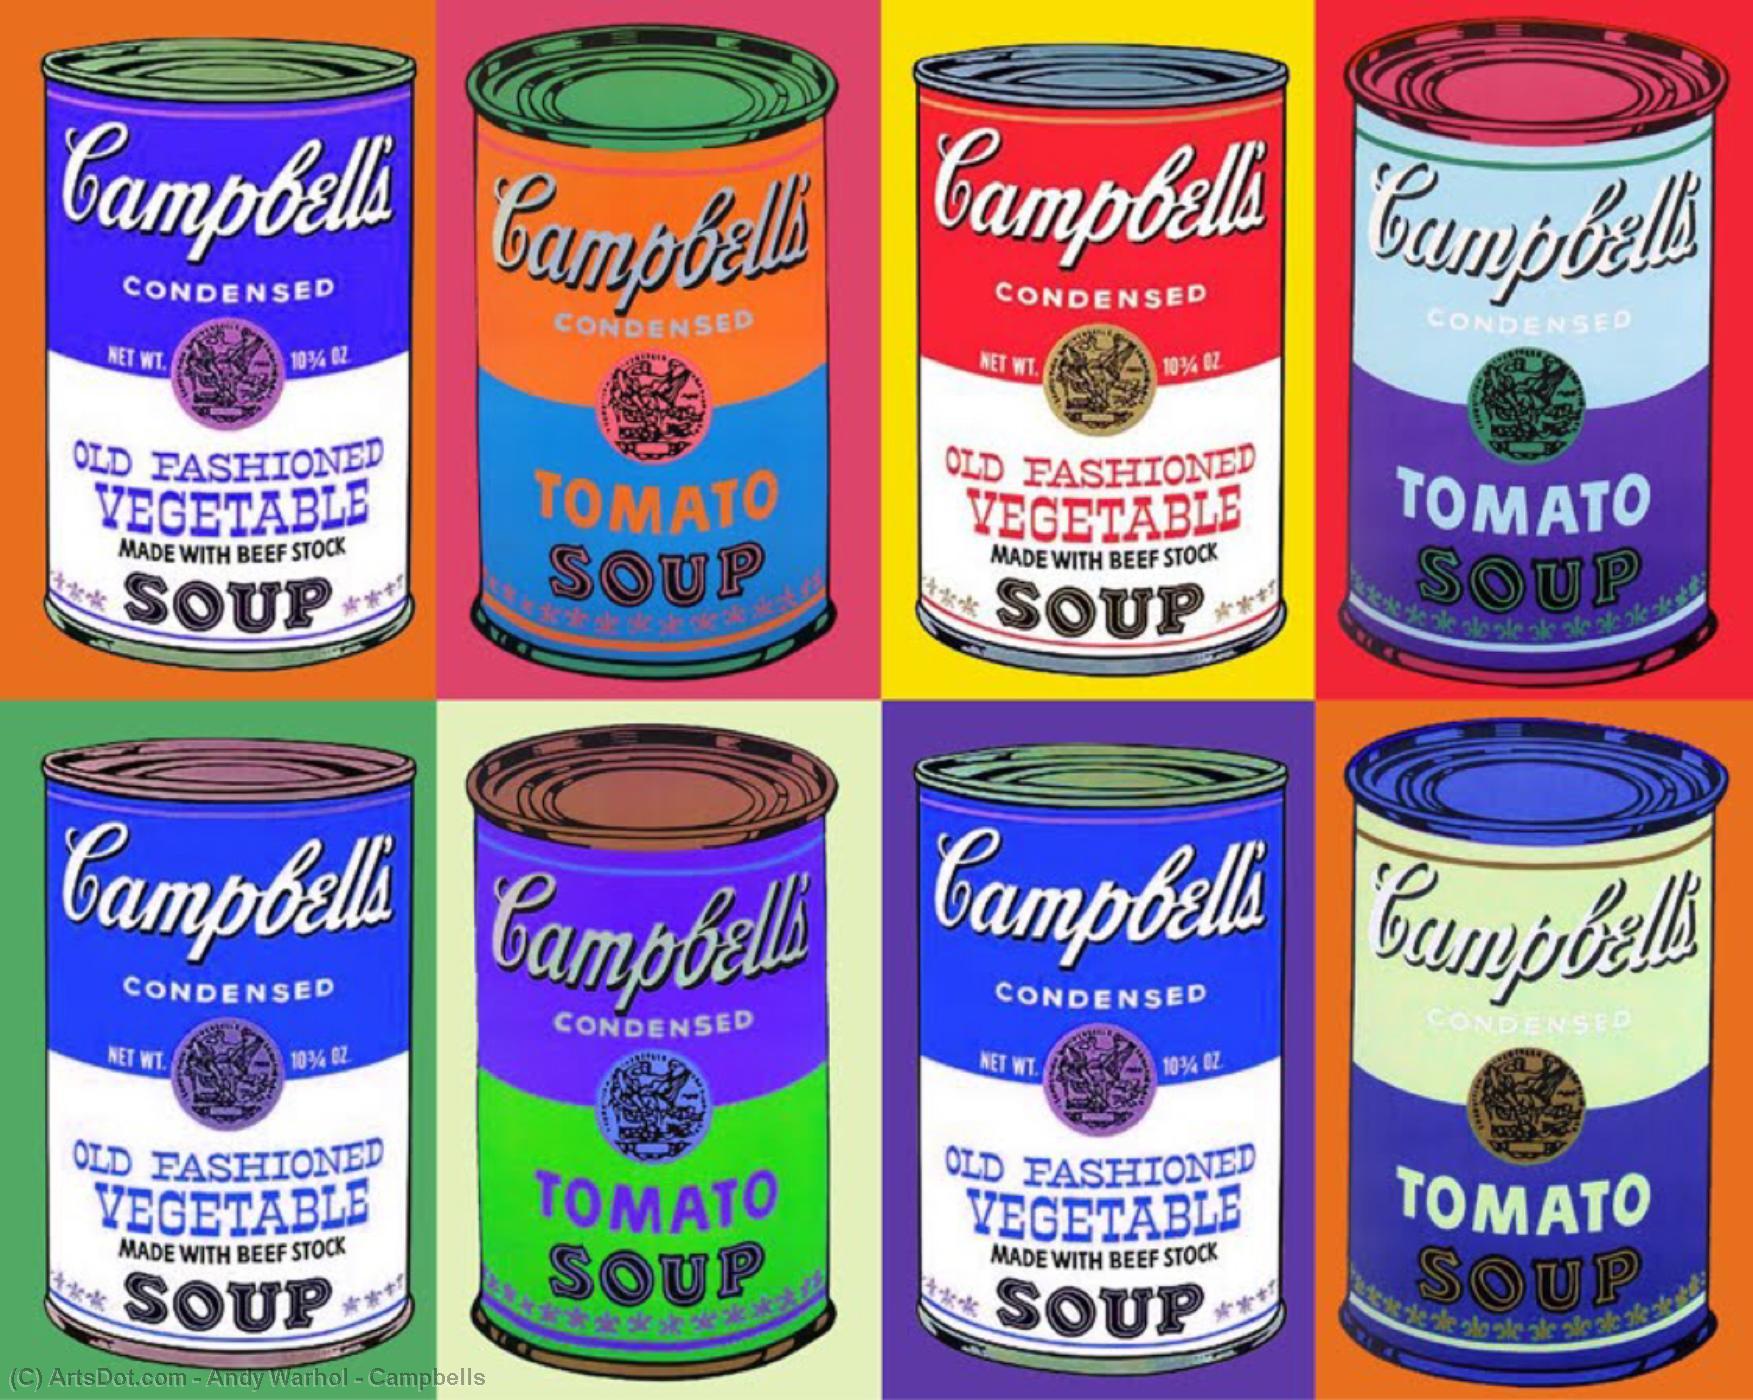 Andy Warhol- Campbells